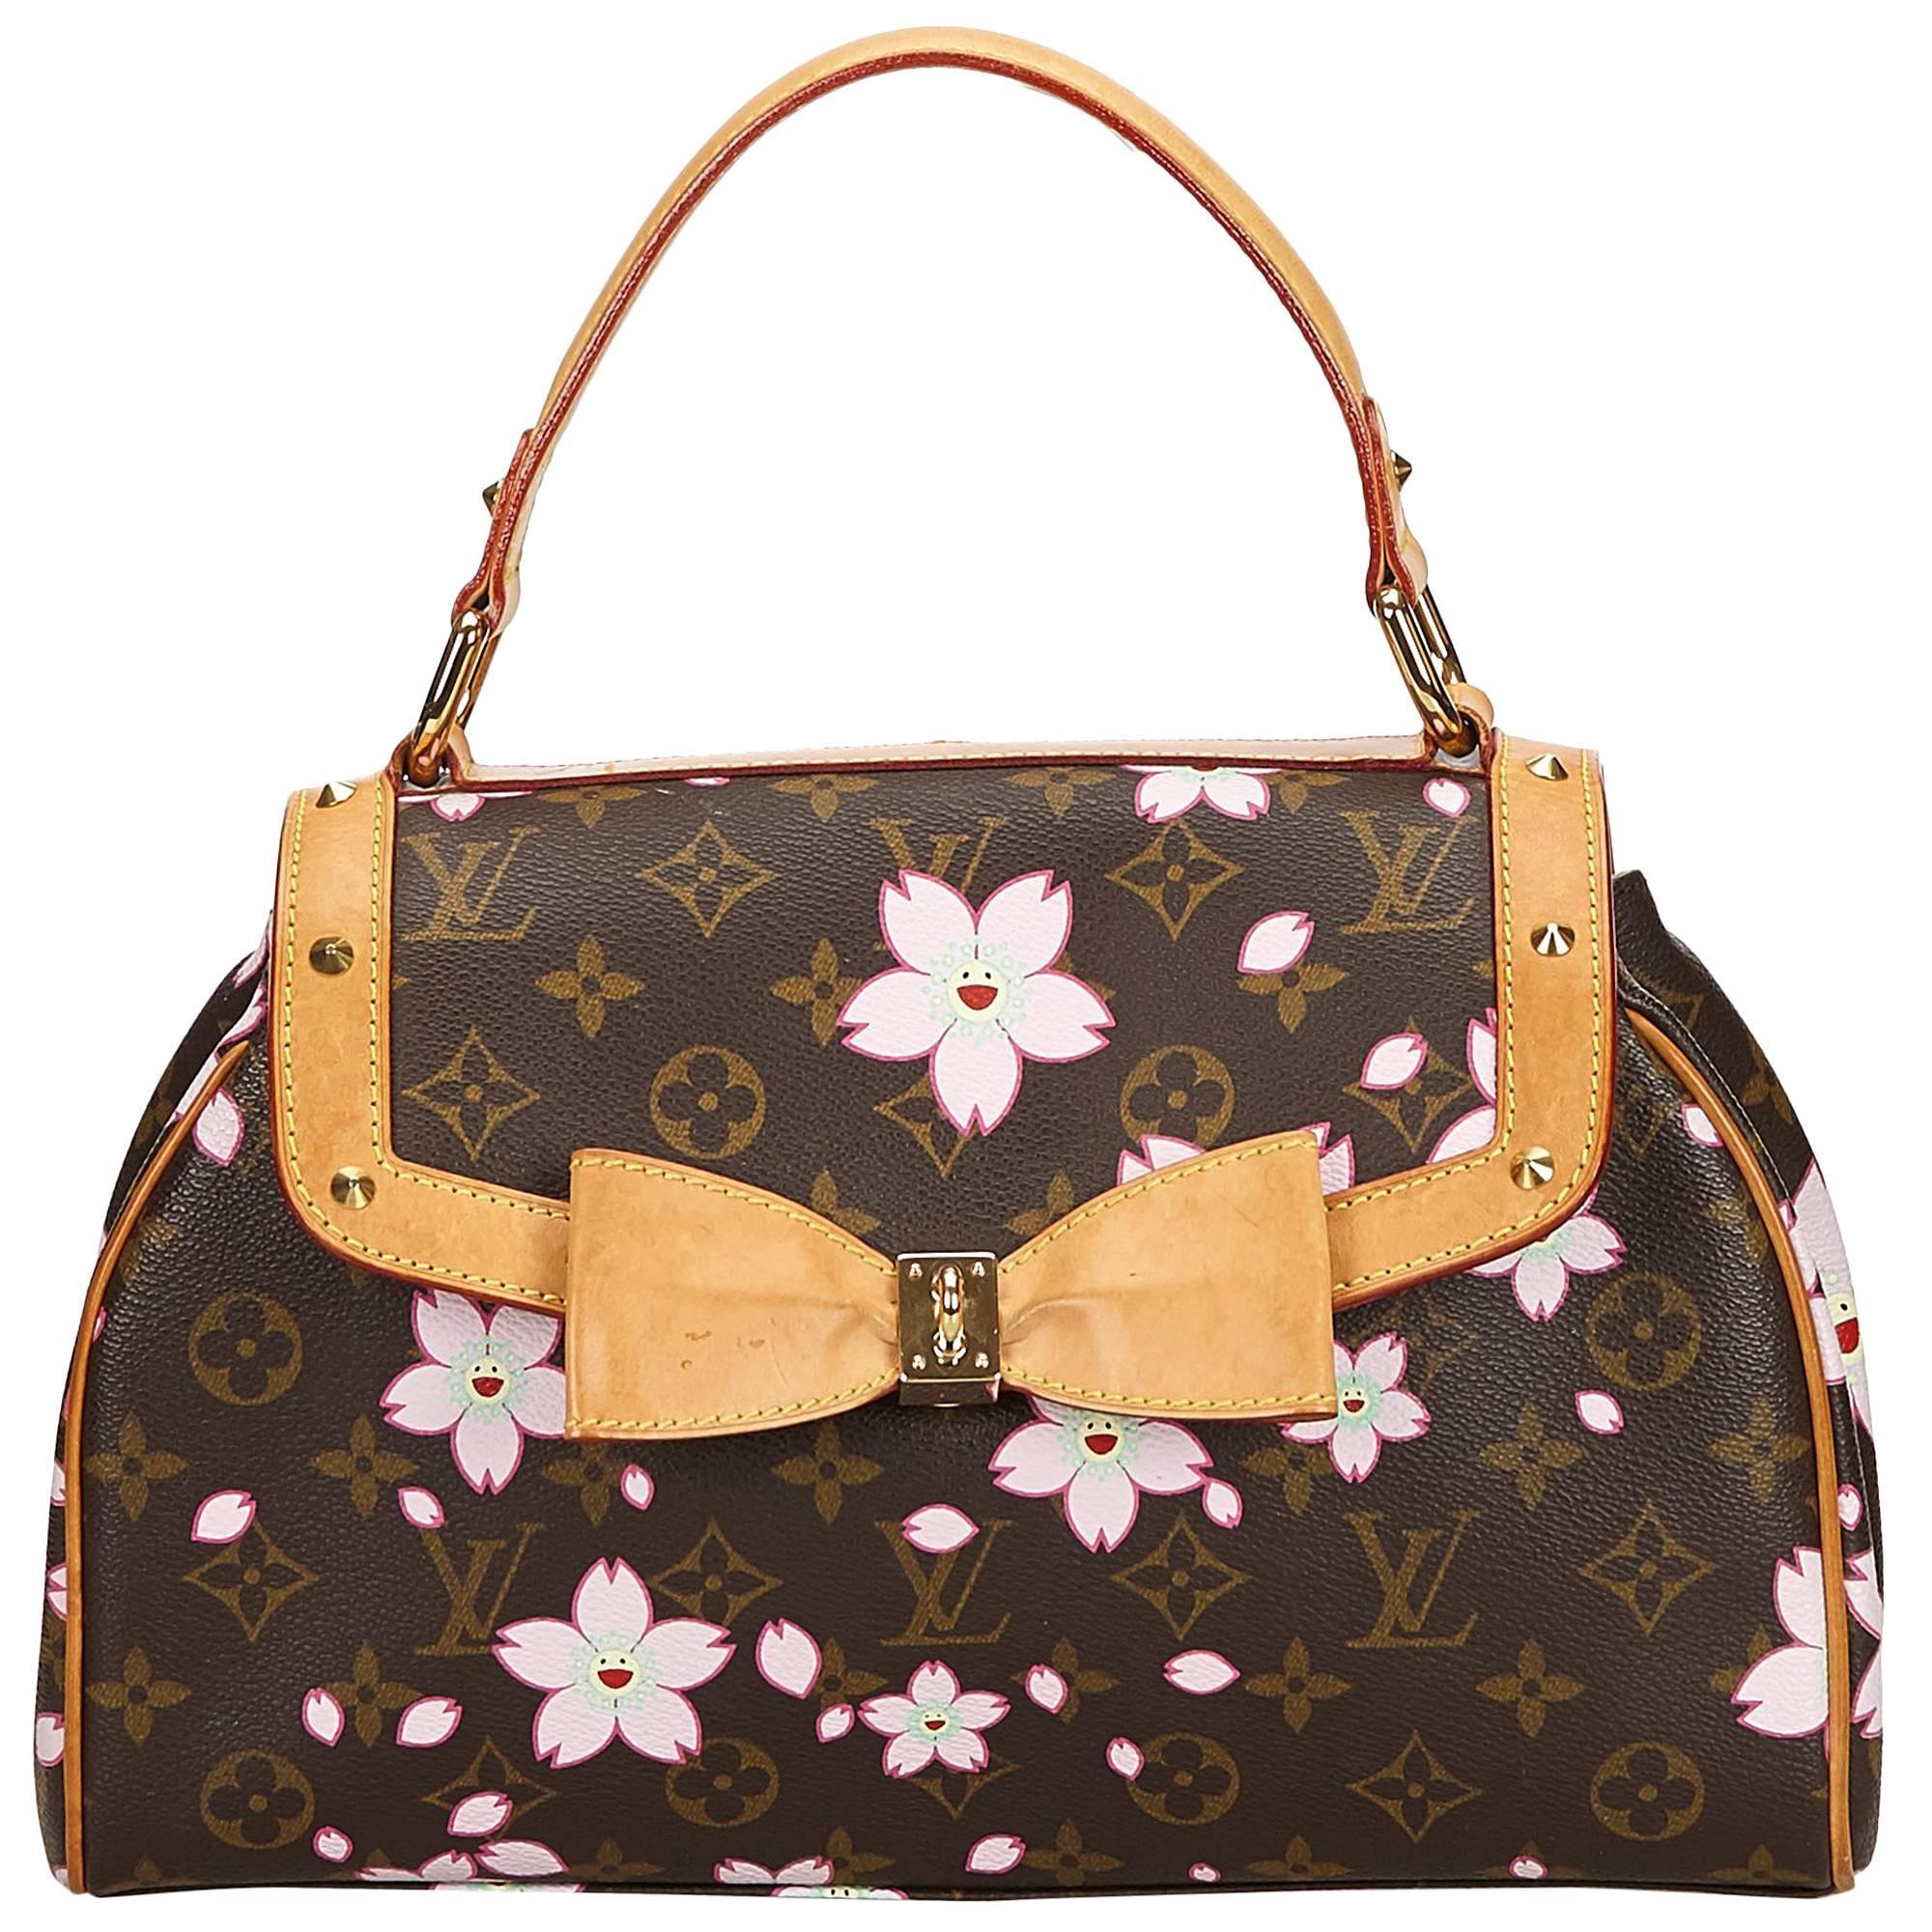 c3e05252901f Louis Vuitton Brown Monogram Murakami Cherry Blossom Sac Retro Bag For Sale  at 1stdibs